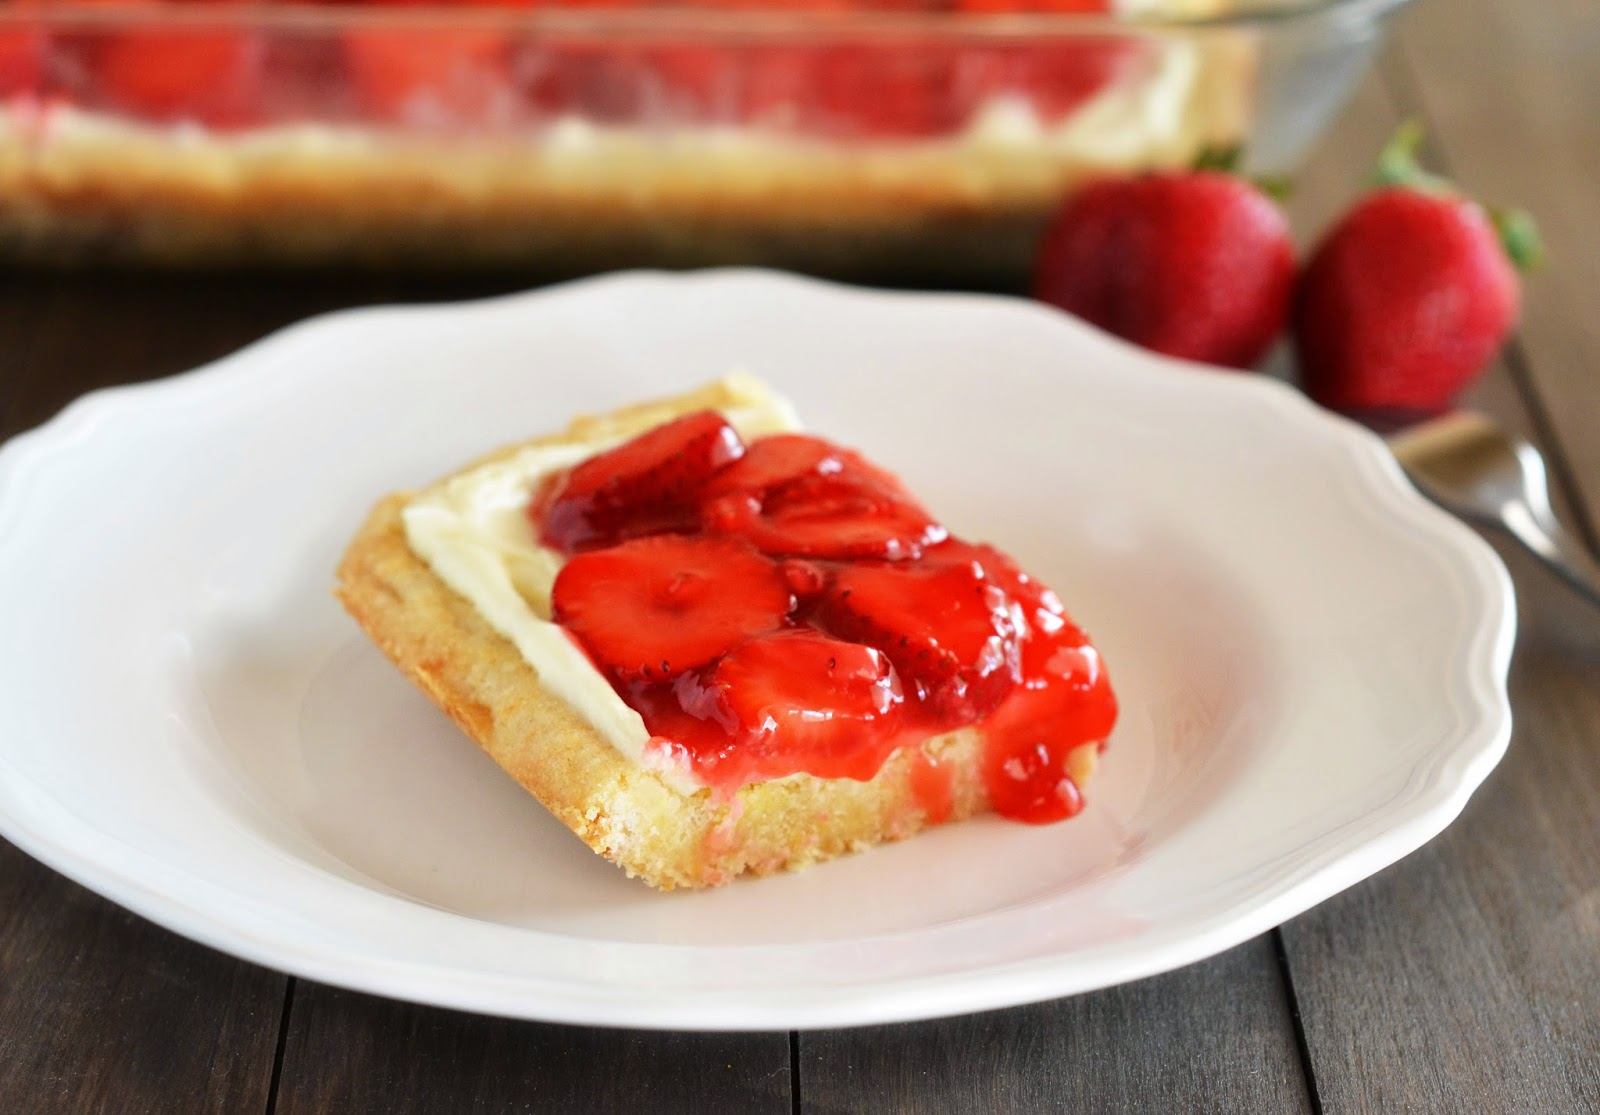 The Country Cook: Strawberries & Cream Dessert Bars